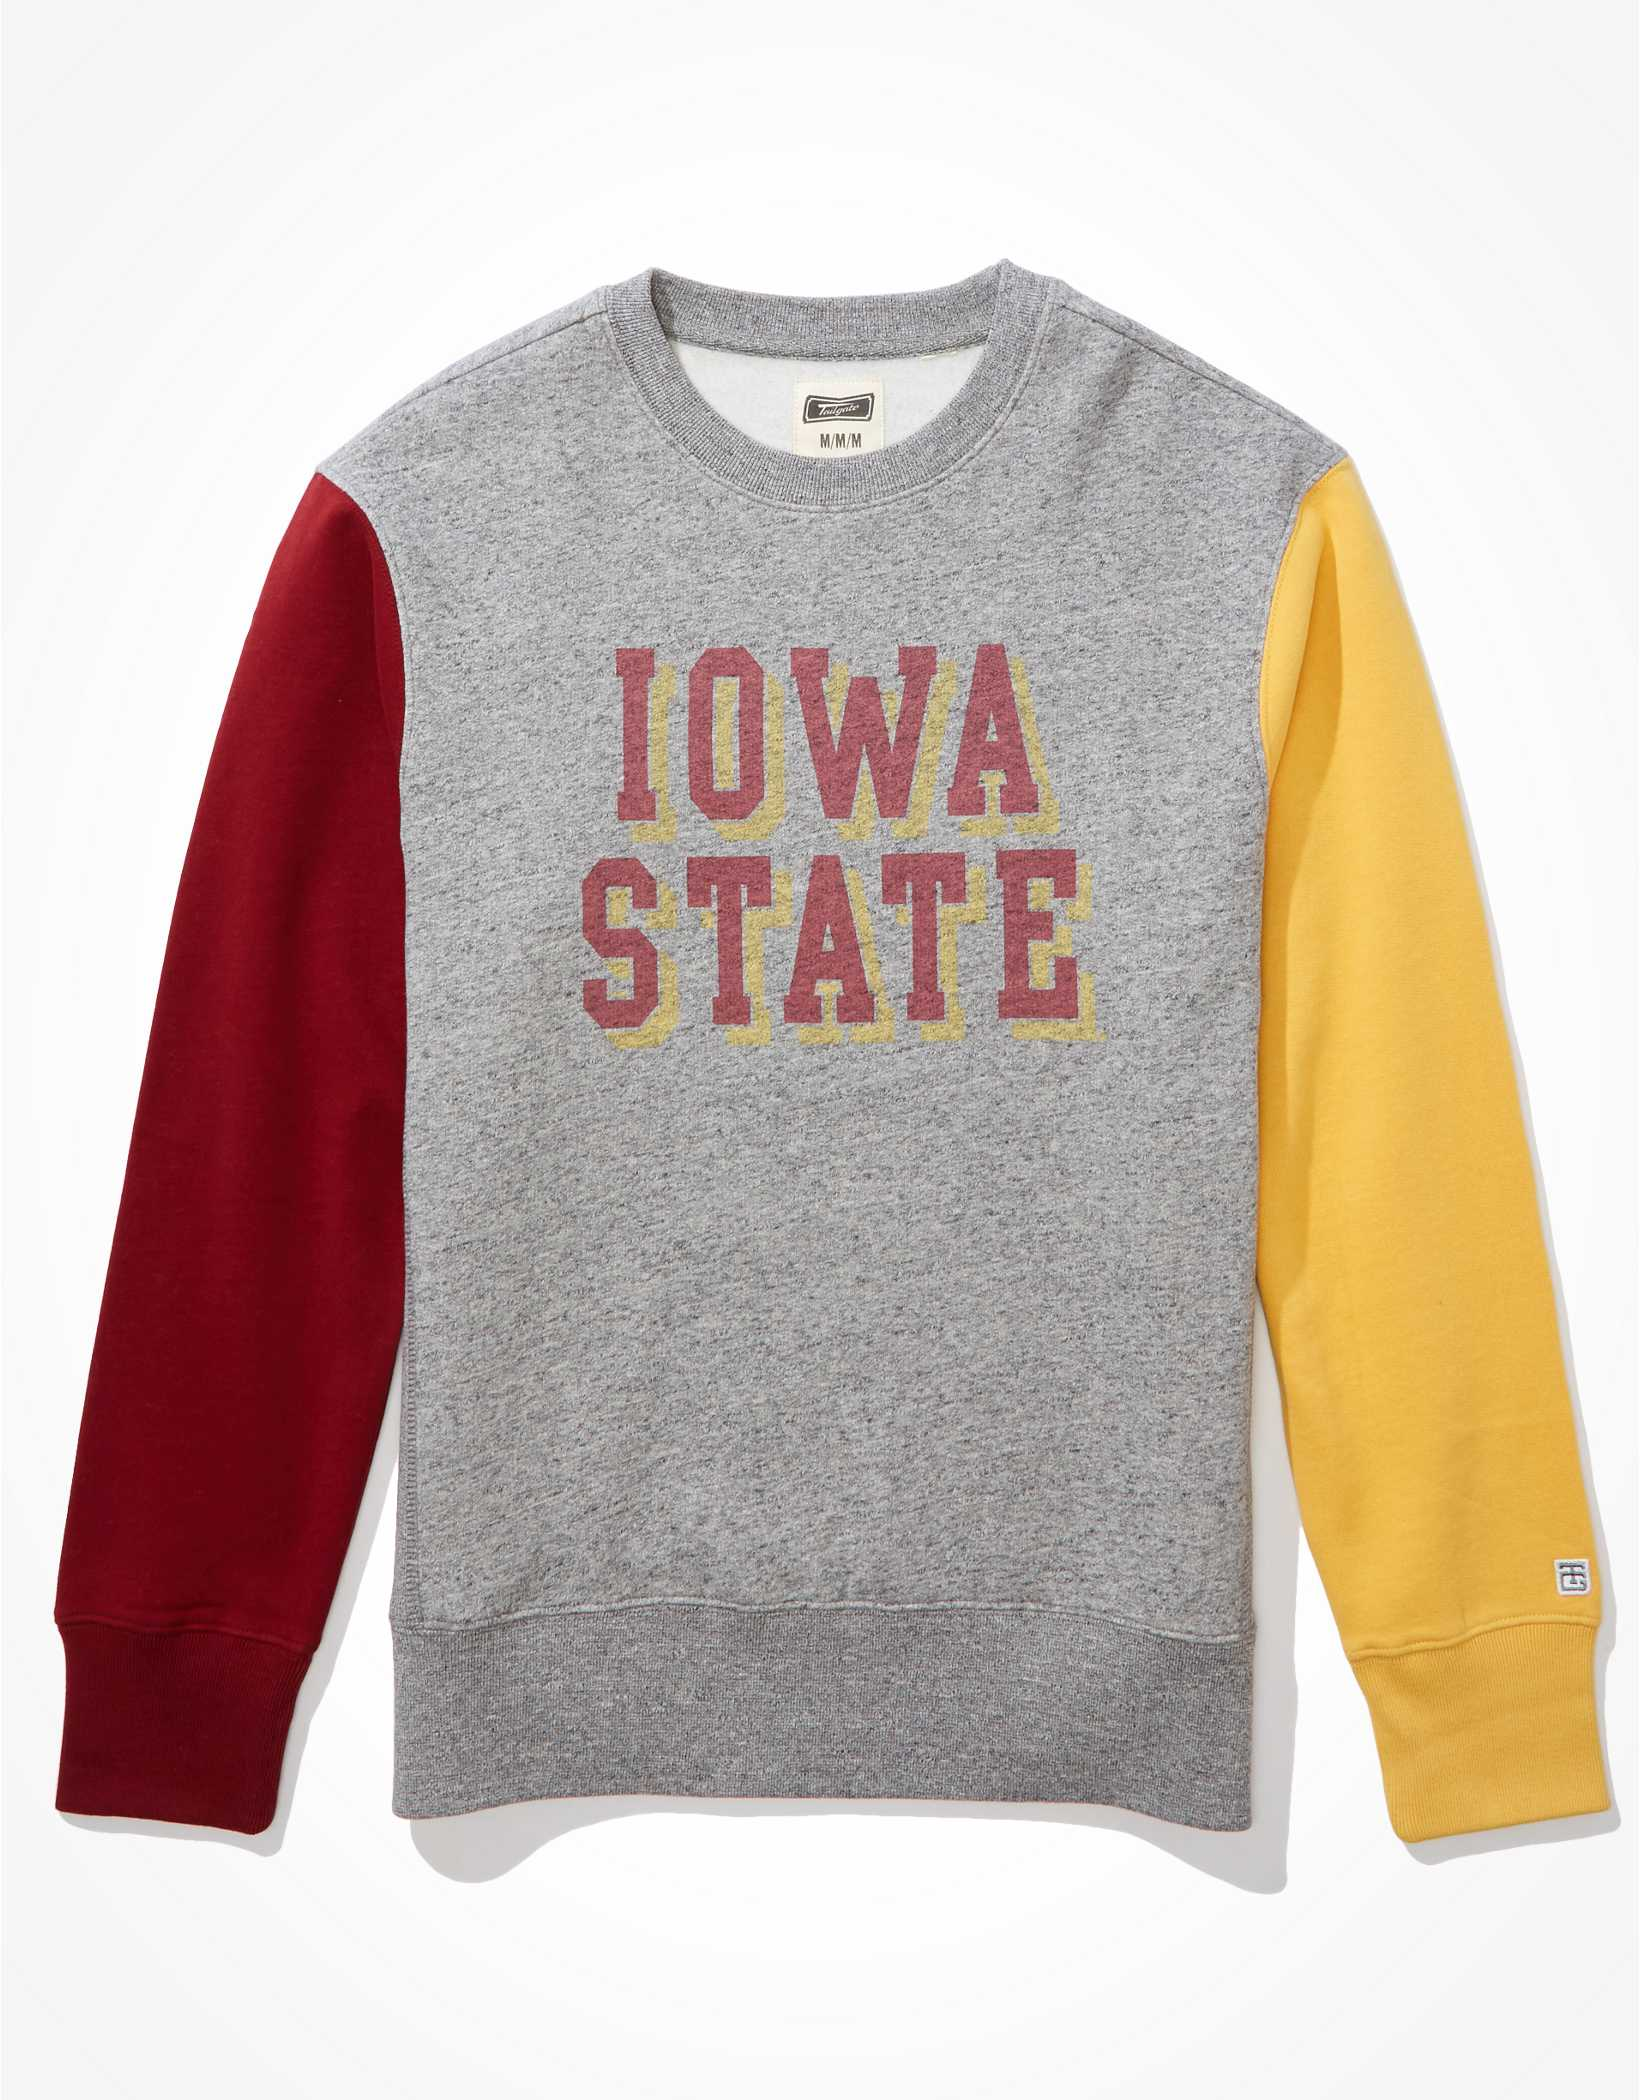 Tailgate Men's ISU Cyclones Colorblock Sweatshirt